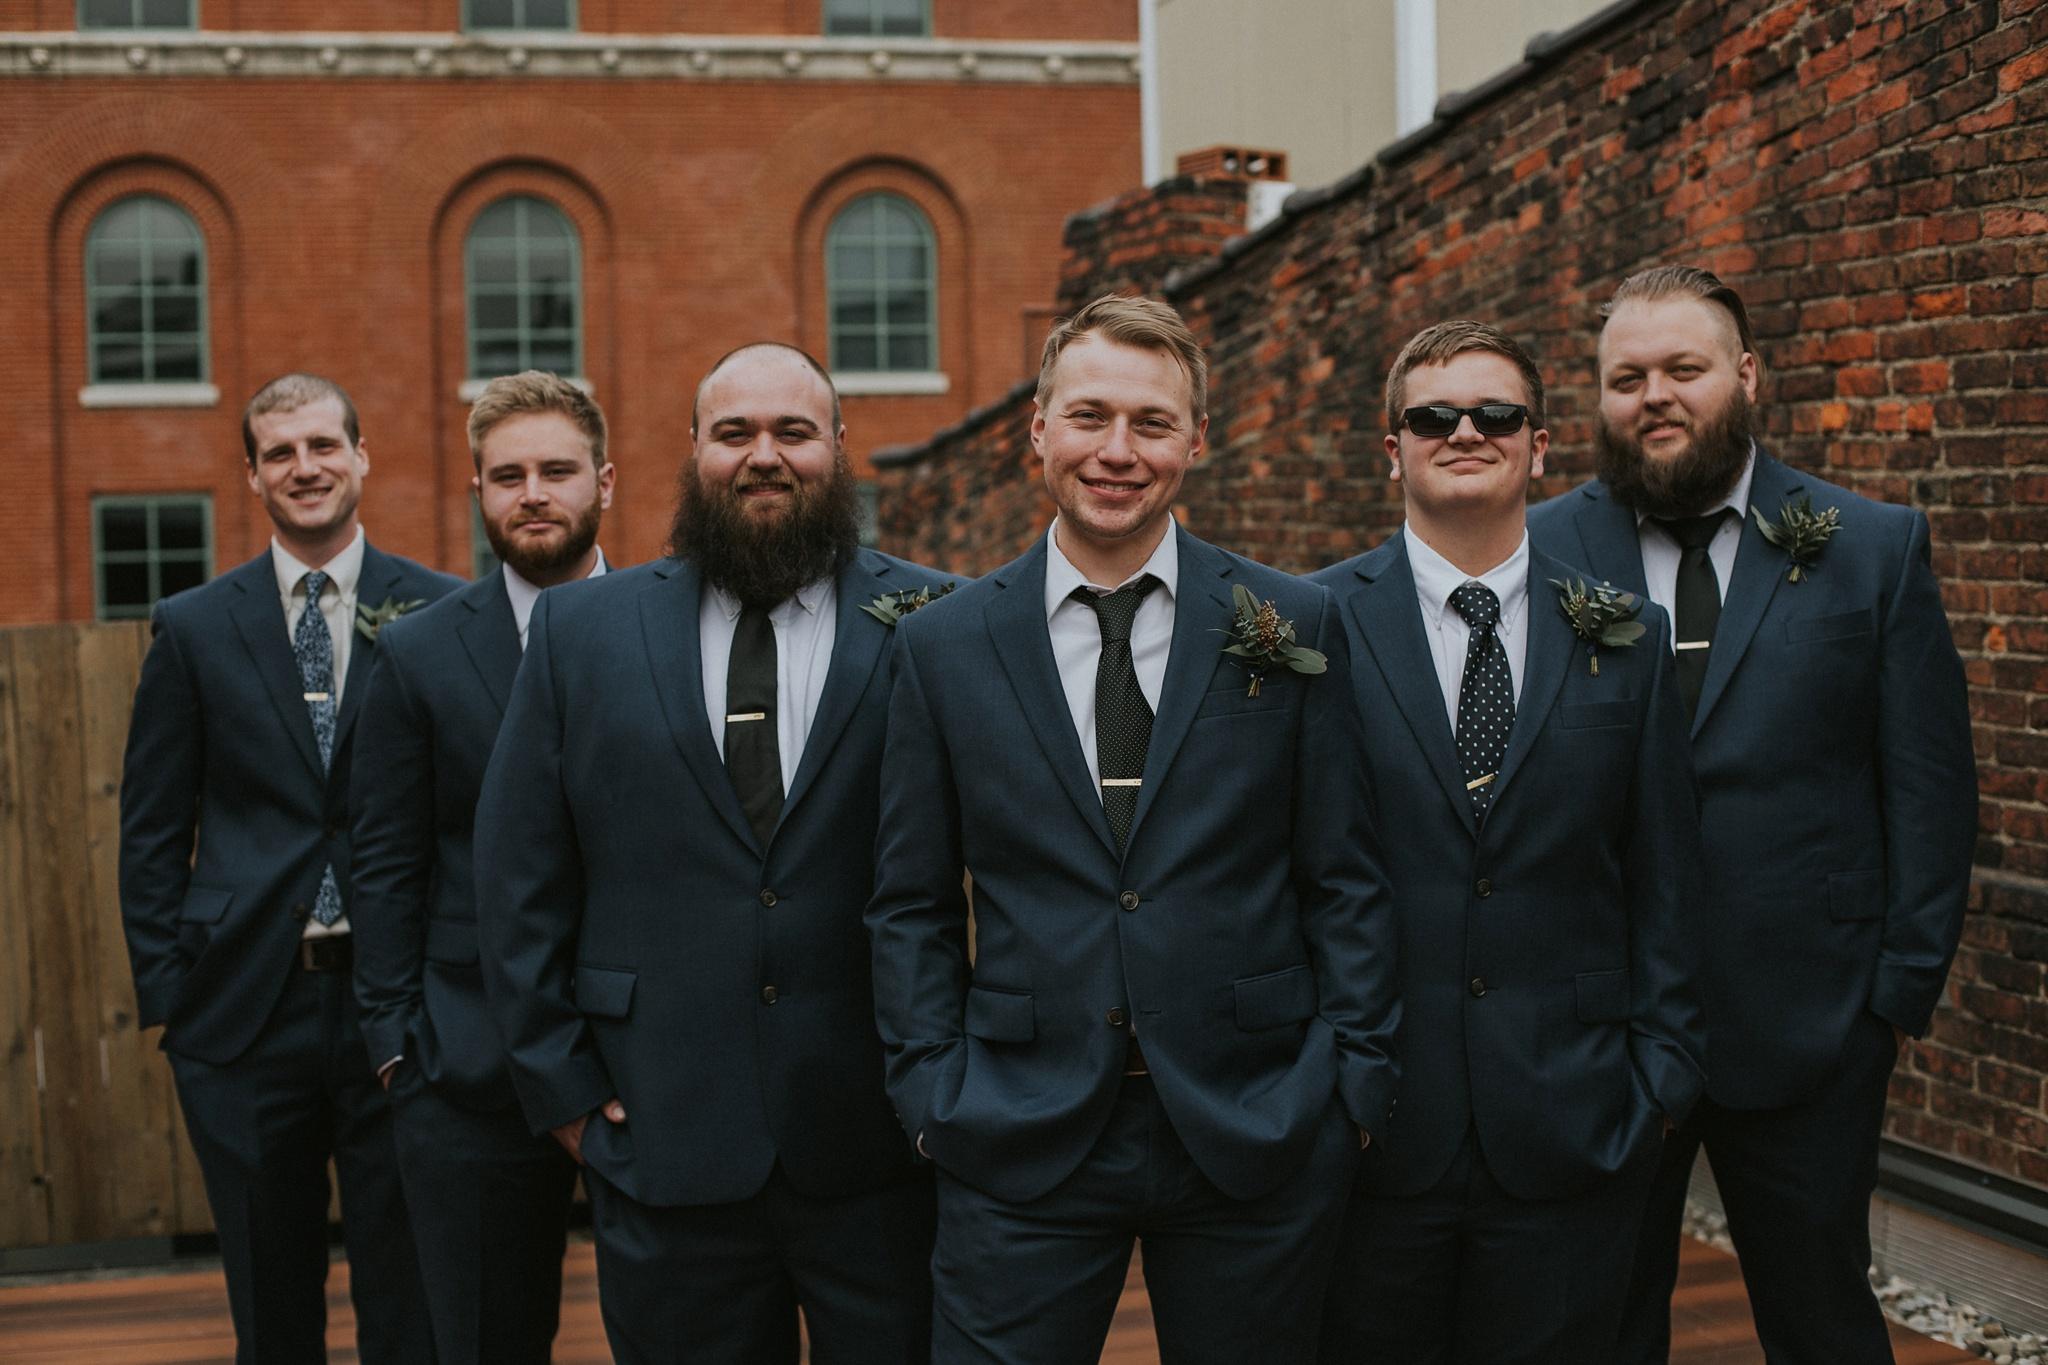 Downtown-Louisville-Surprise-Wedding_0025.jpg